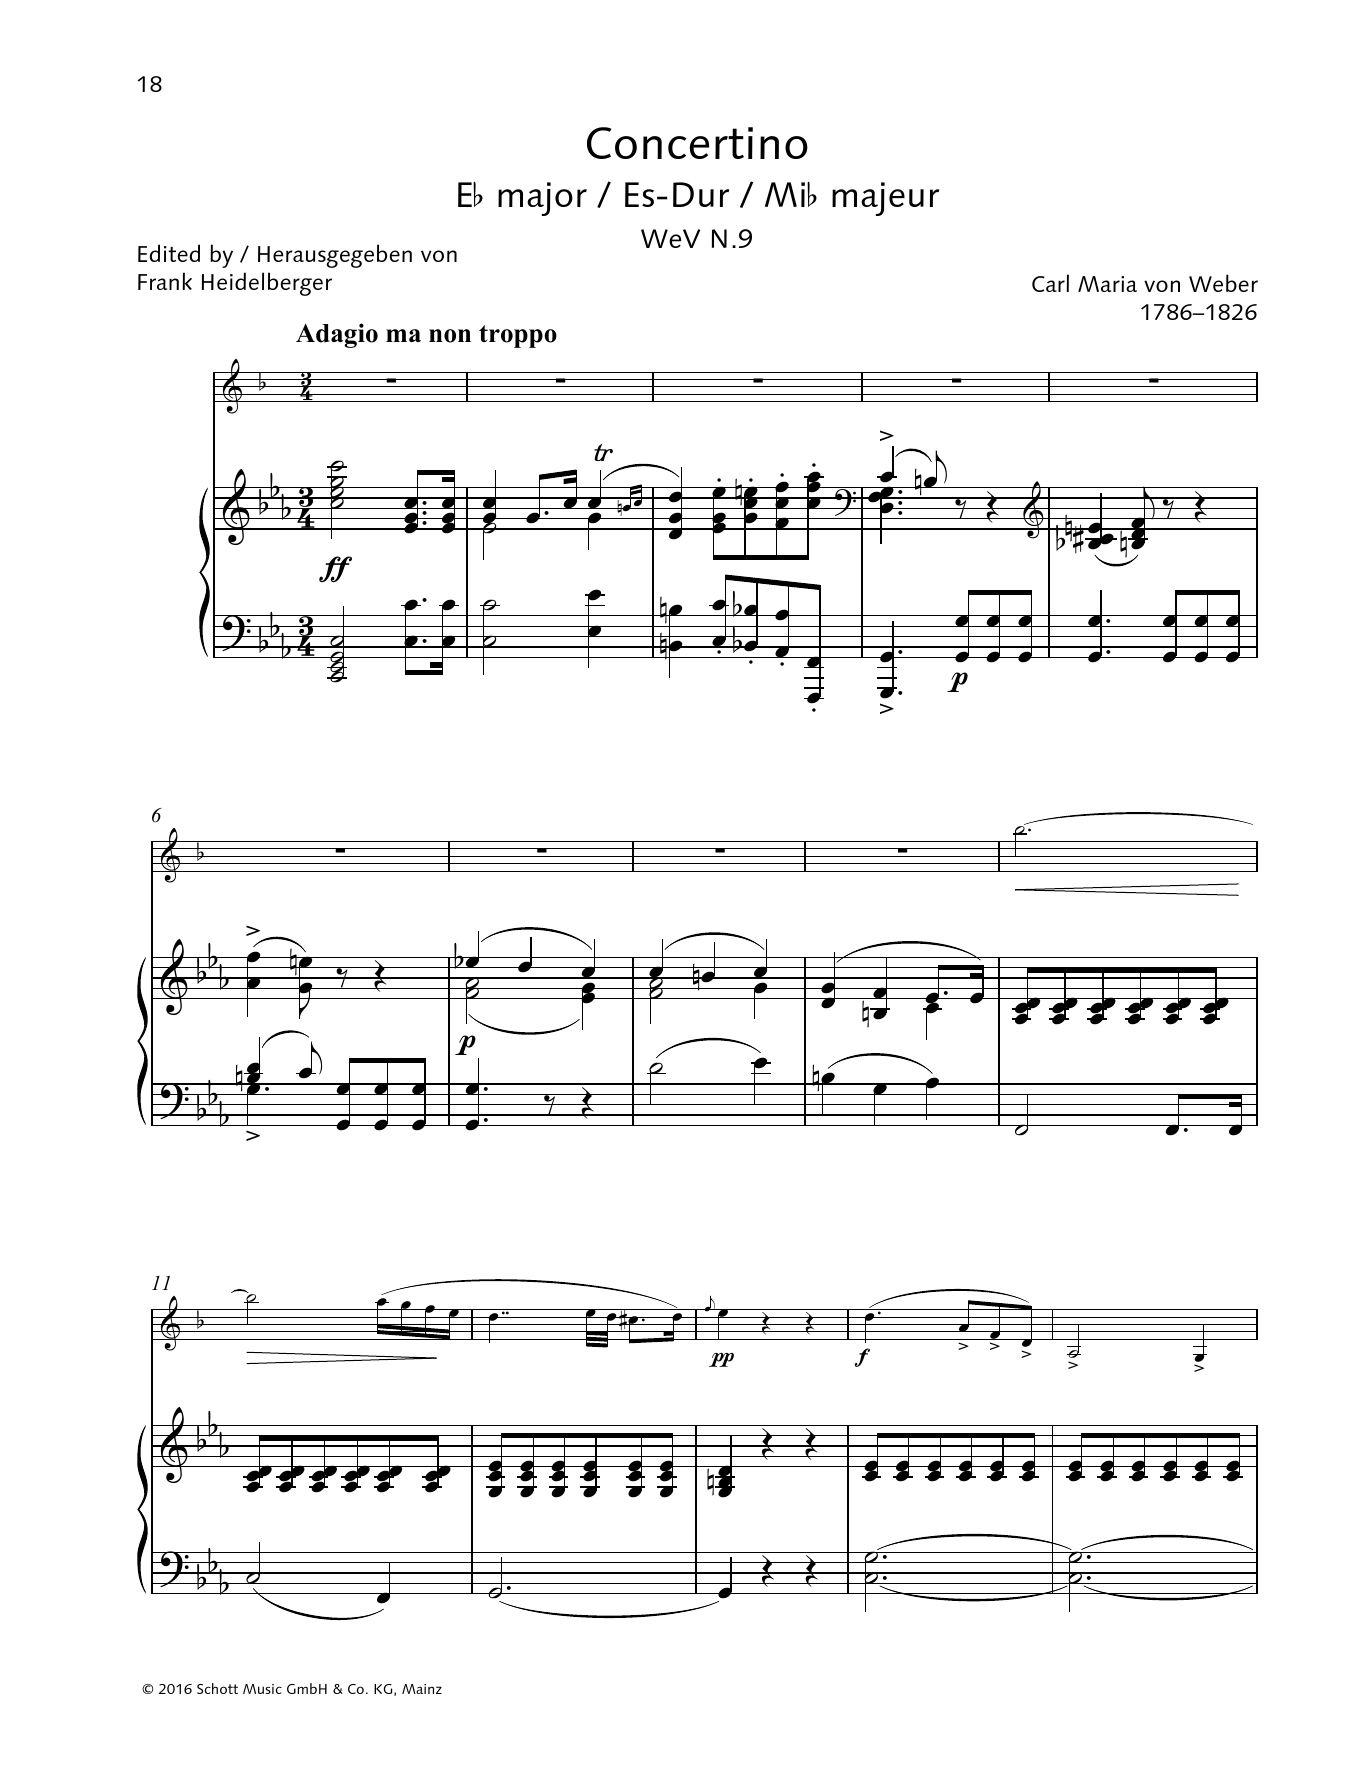 Concertino E-flat major